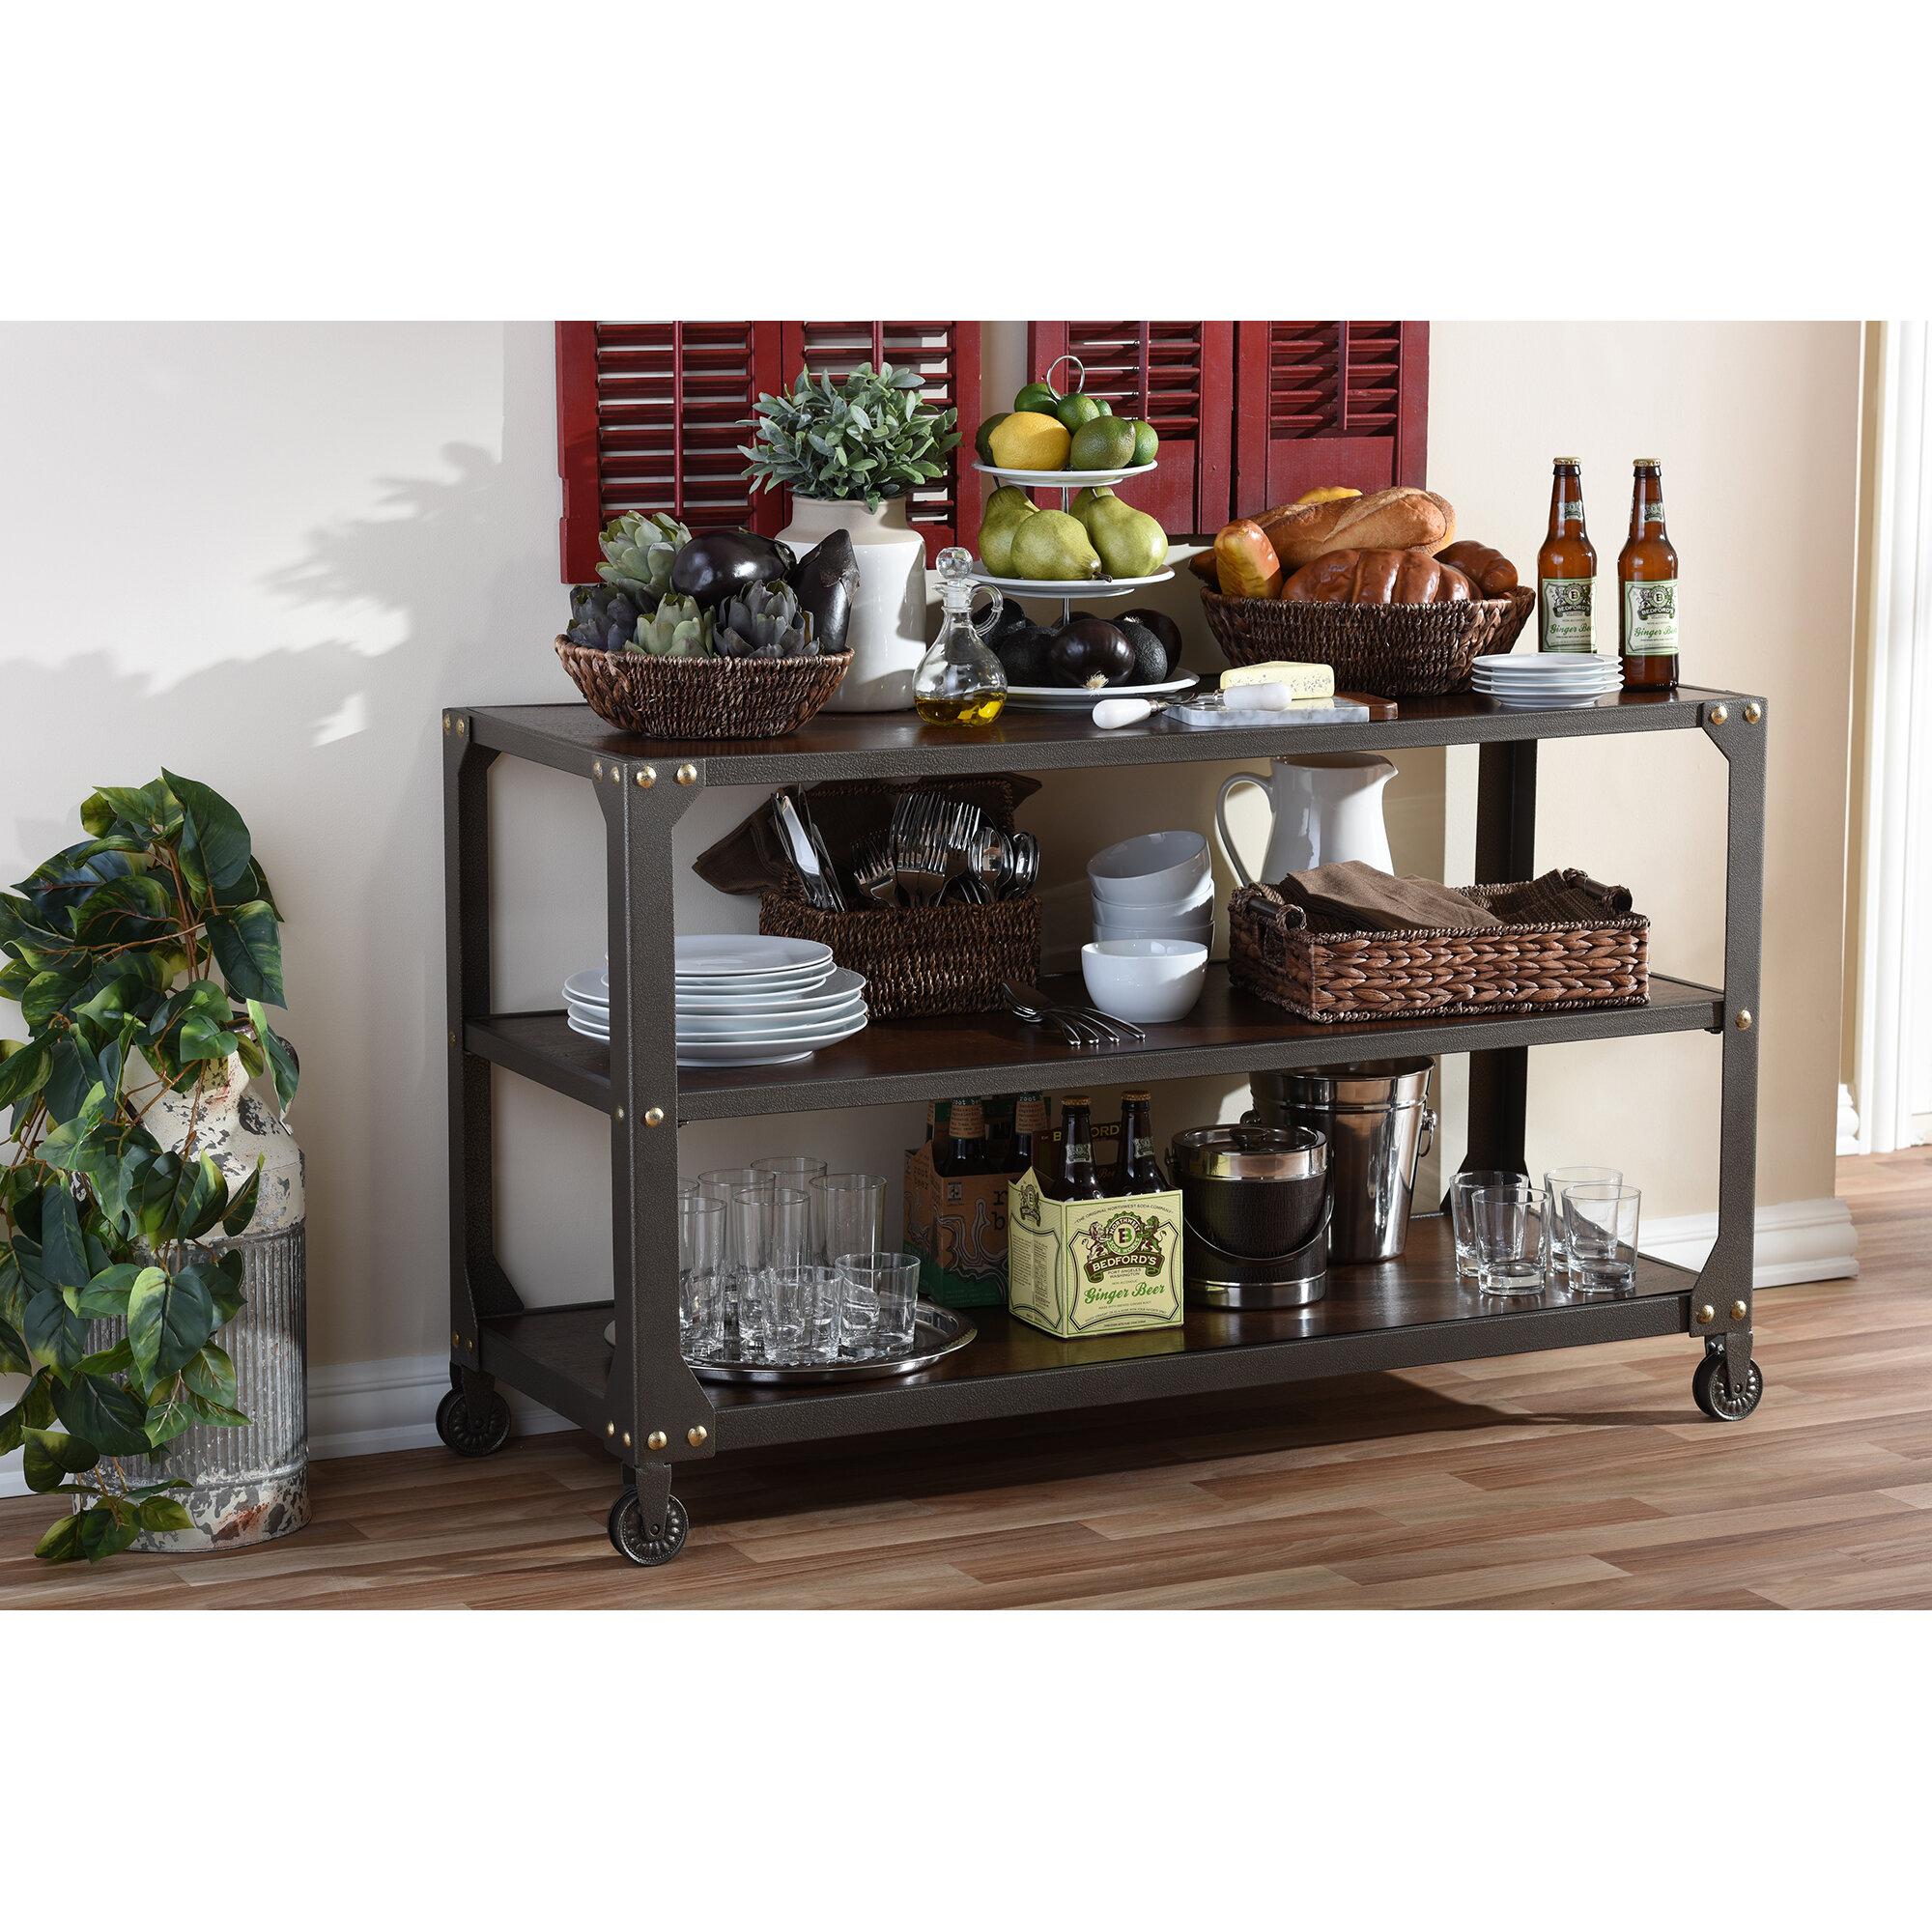 Rollins Industrial Loft Bronze Iron Console Table: Wholesale Interiors Baxton Studio Dreydon Console Table